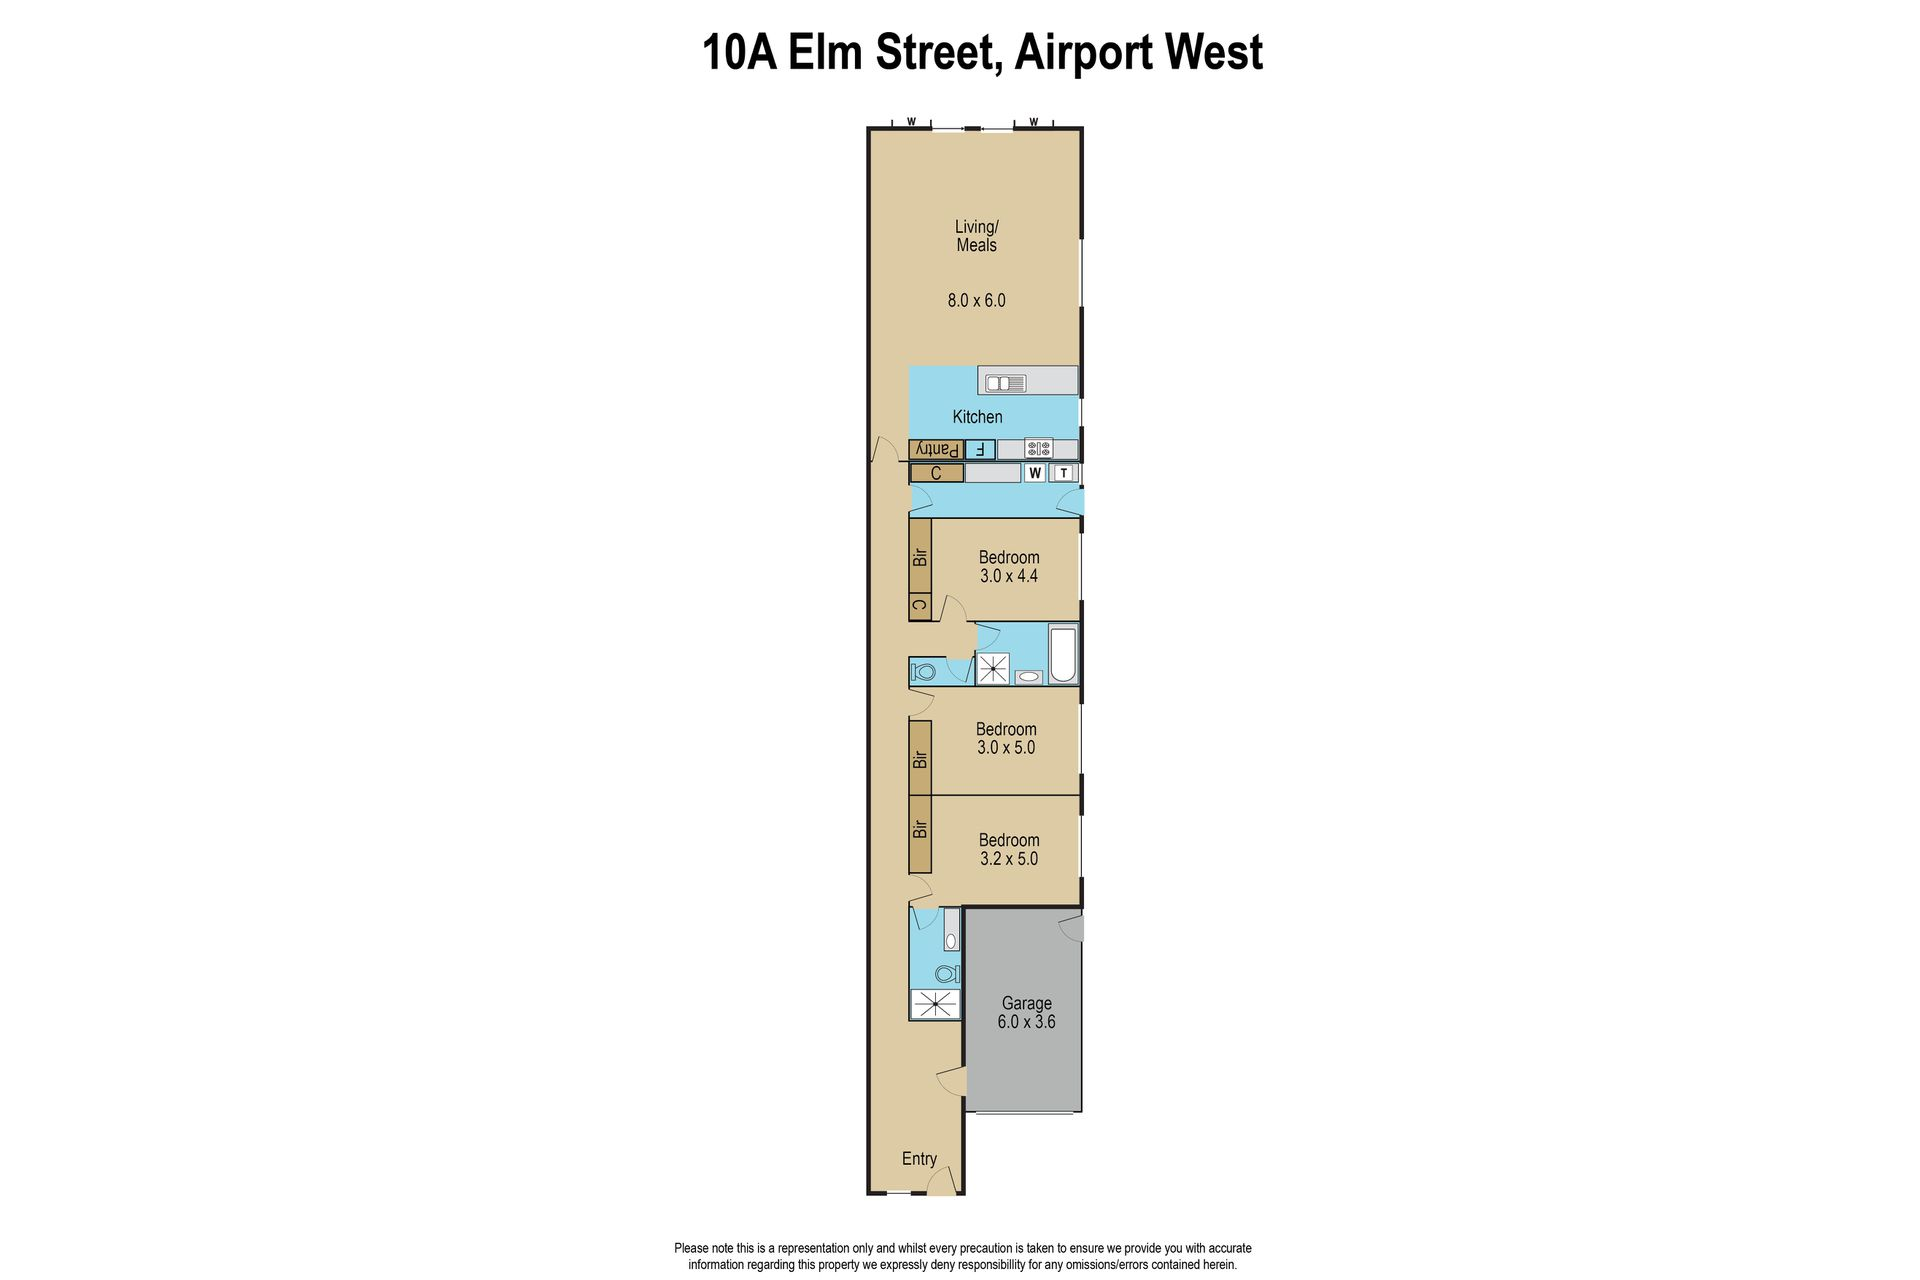 10 Elm Street, Airport West